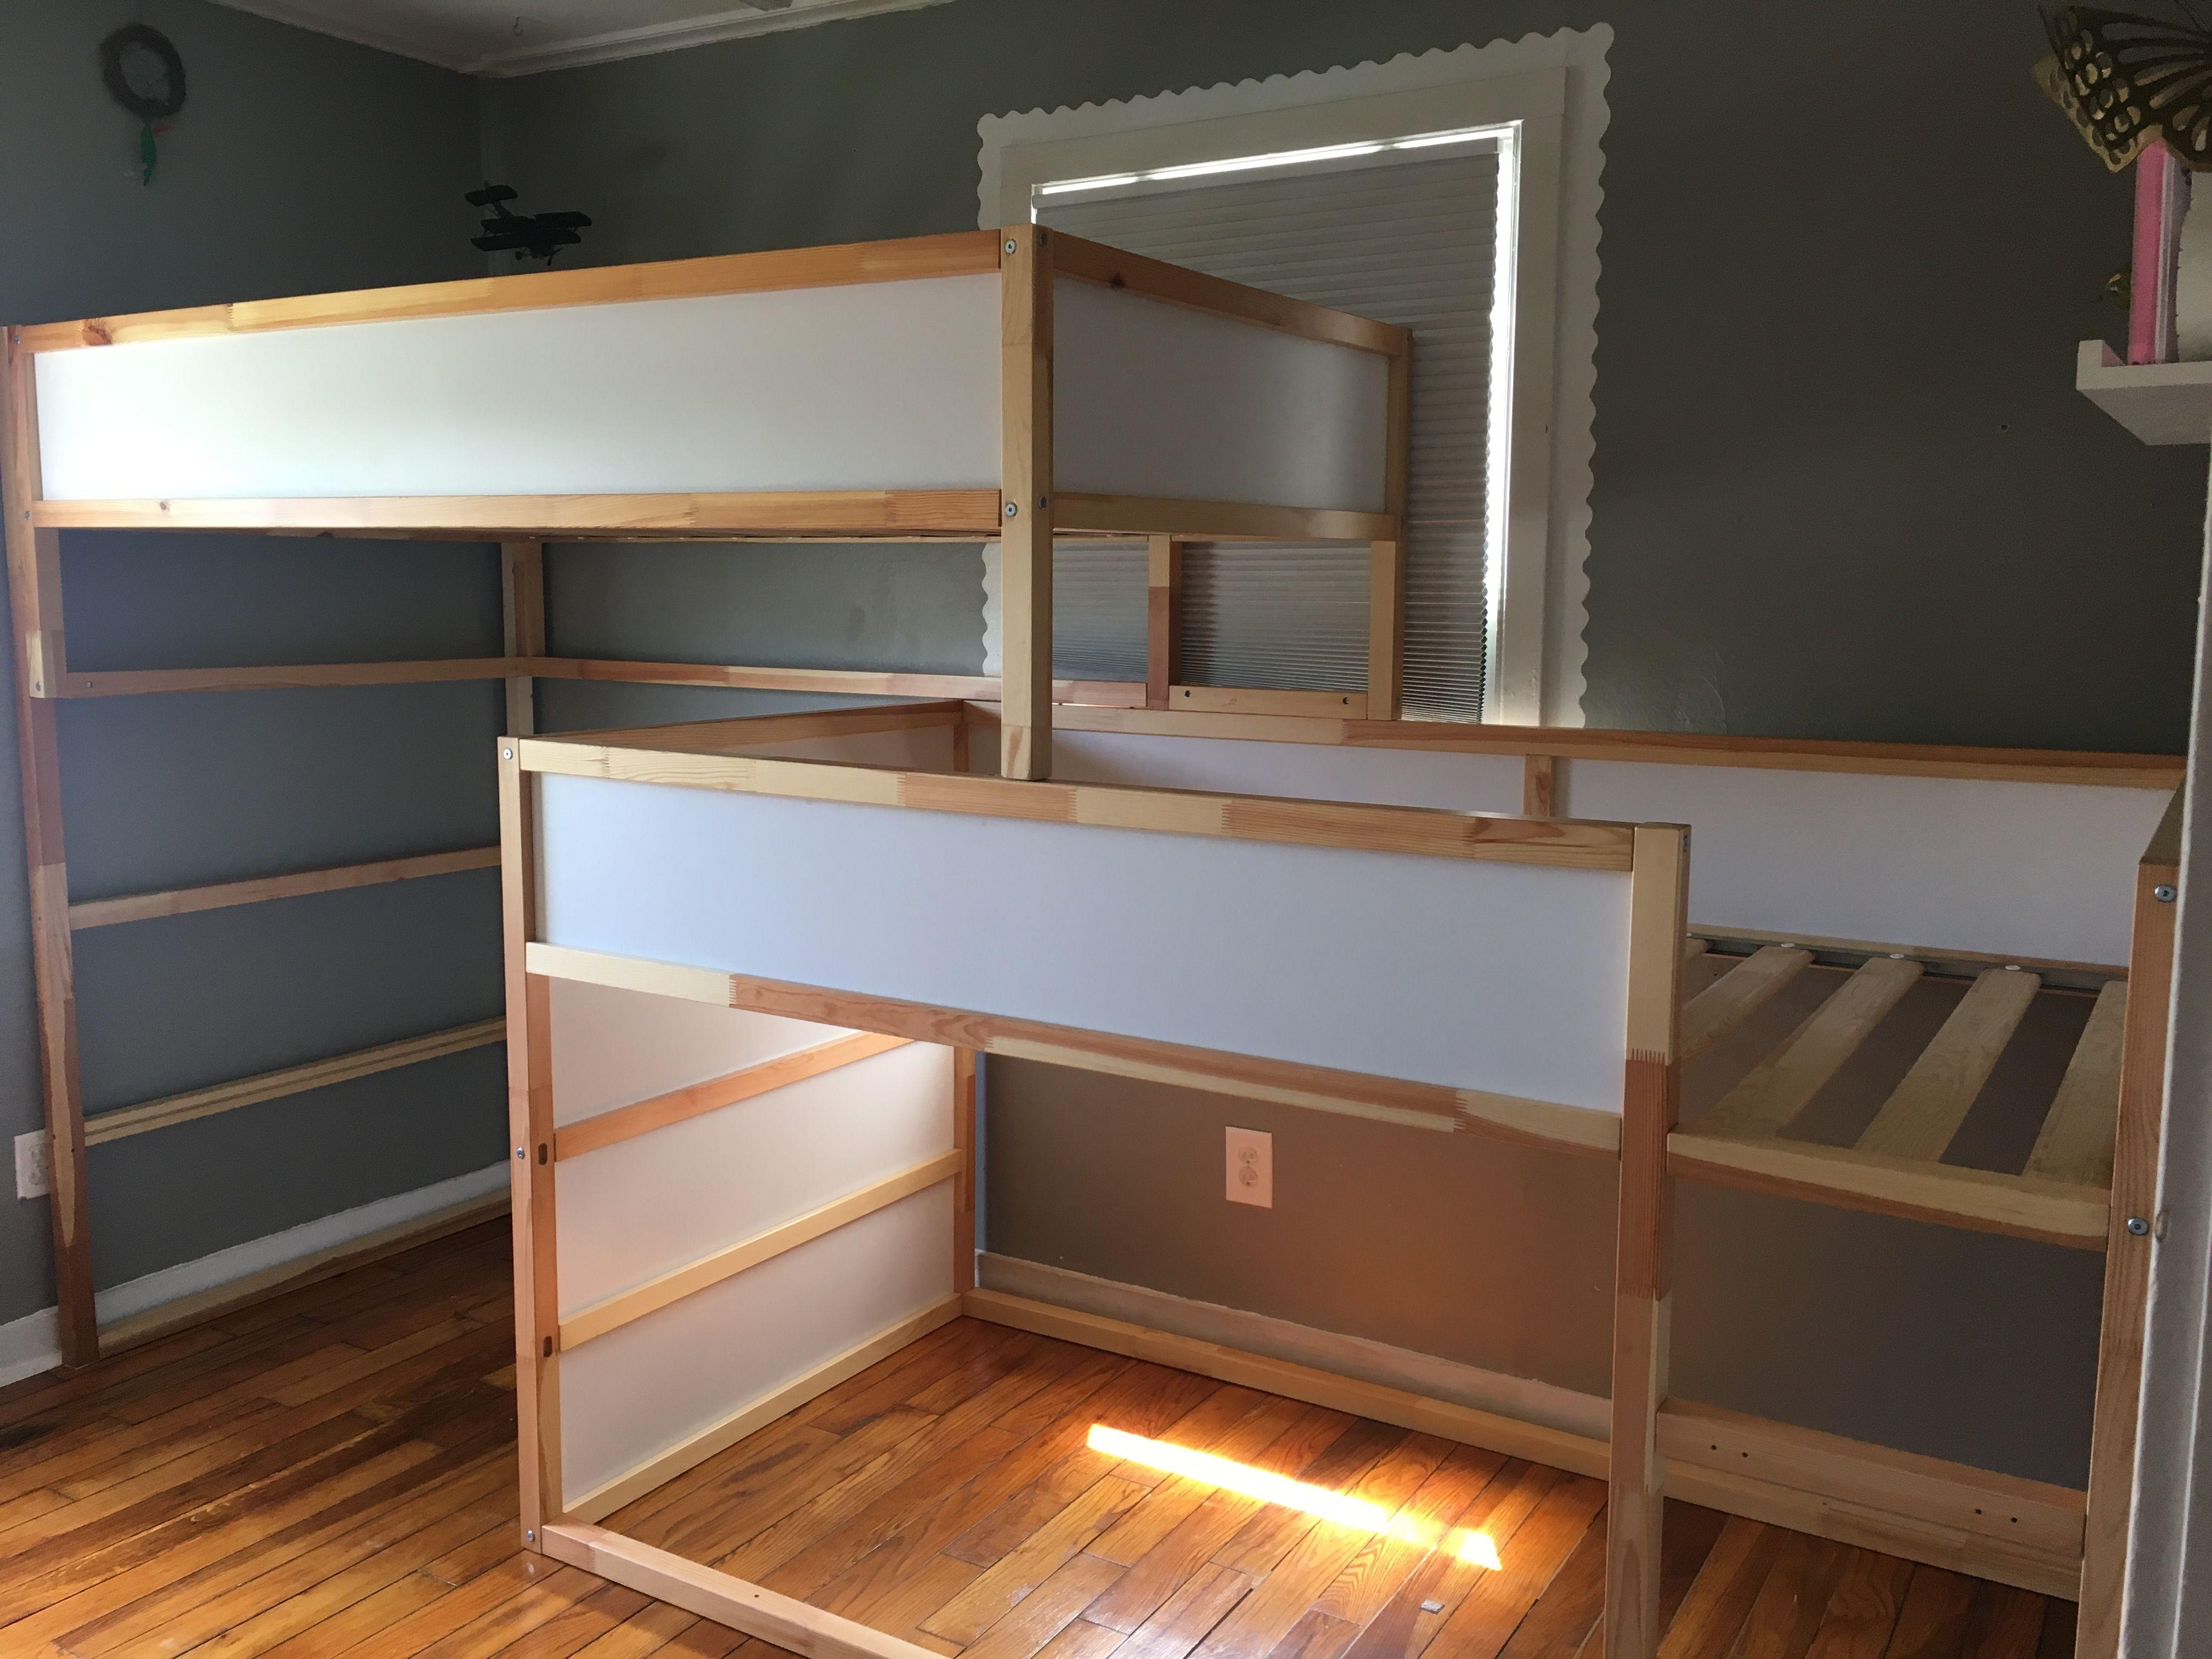 Ikea Kura Triple Bunk Bed Hack Diy Bunk Bed Triple Bunk Bed Triple Bunk Bed Ikea